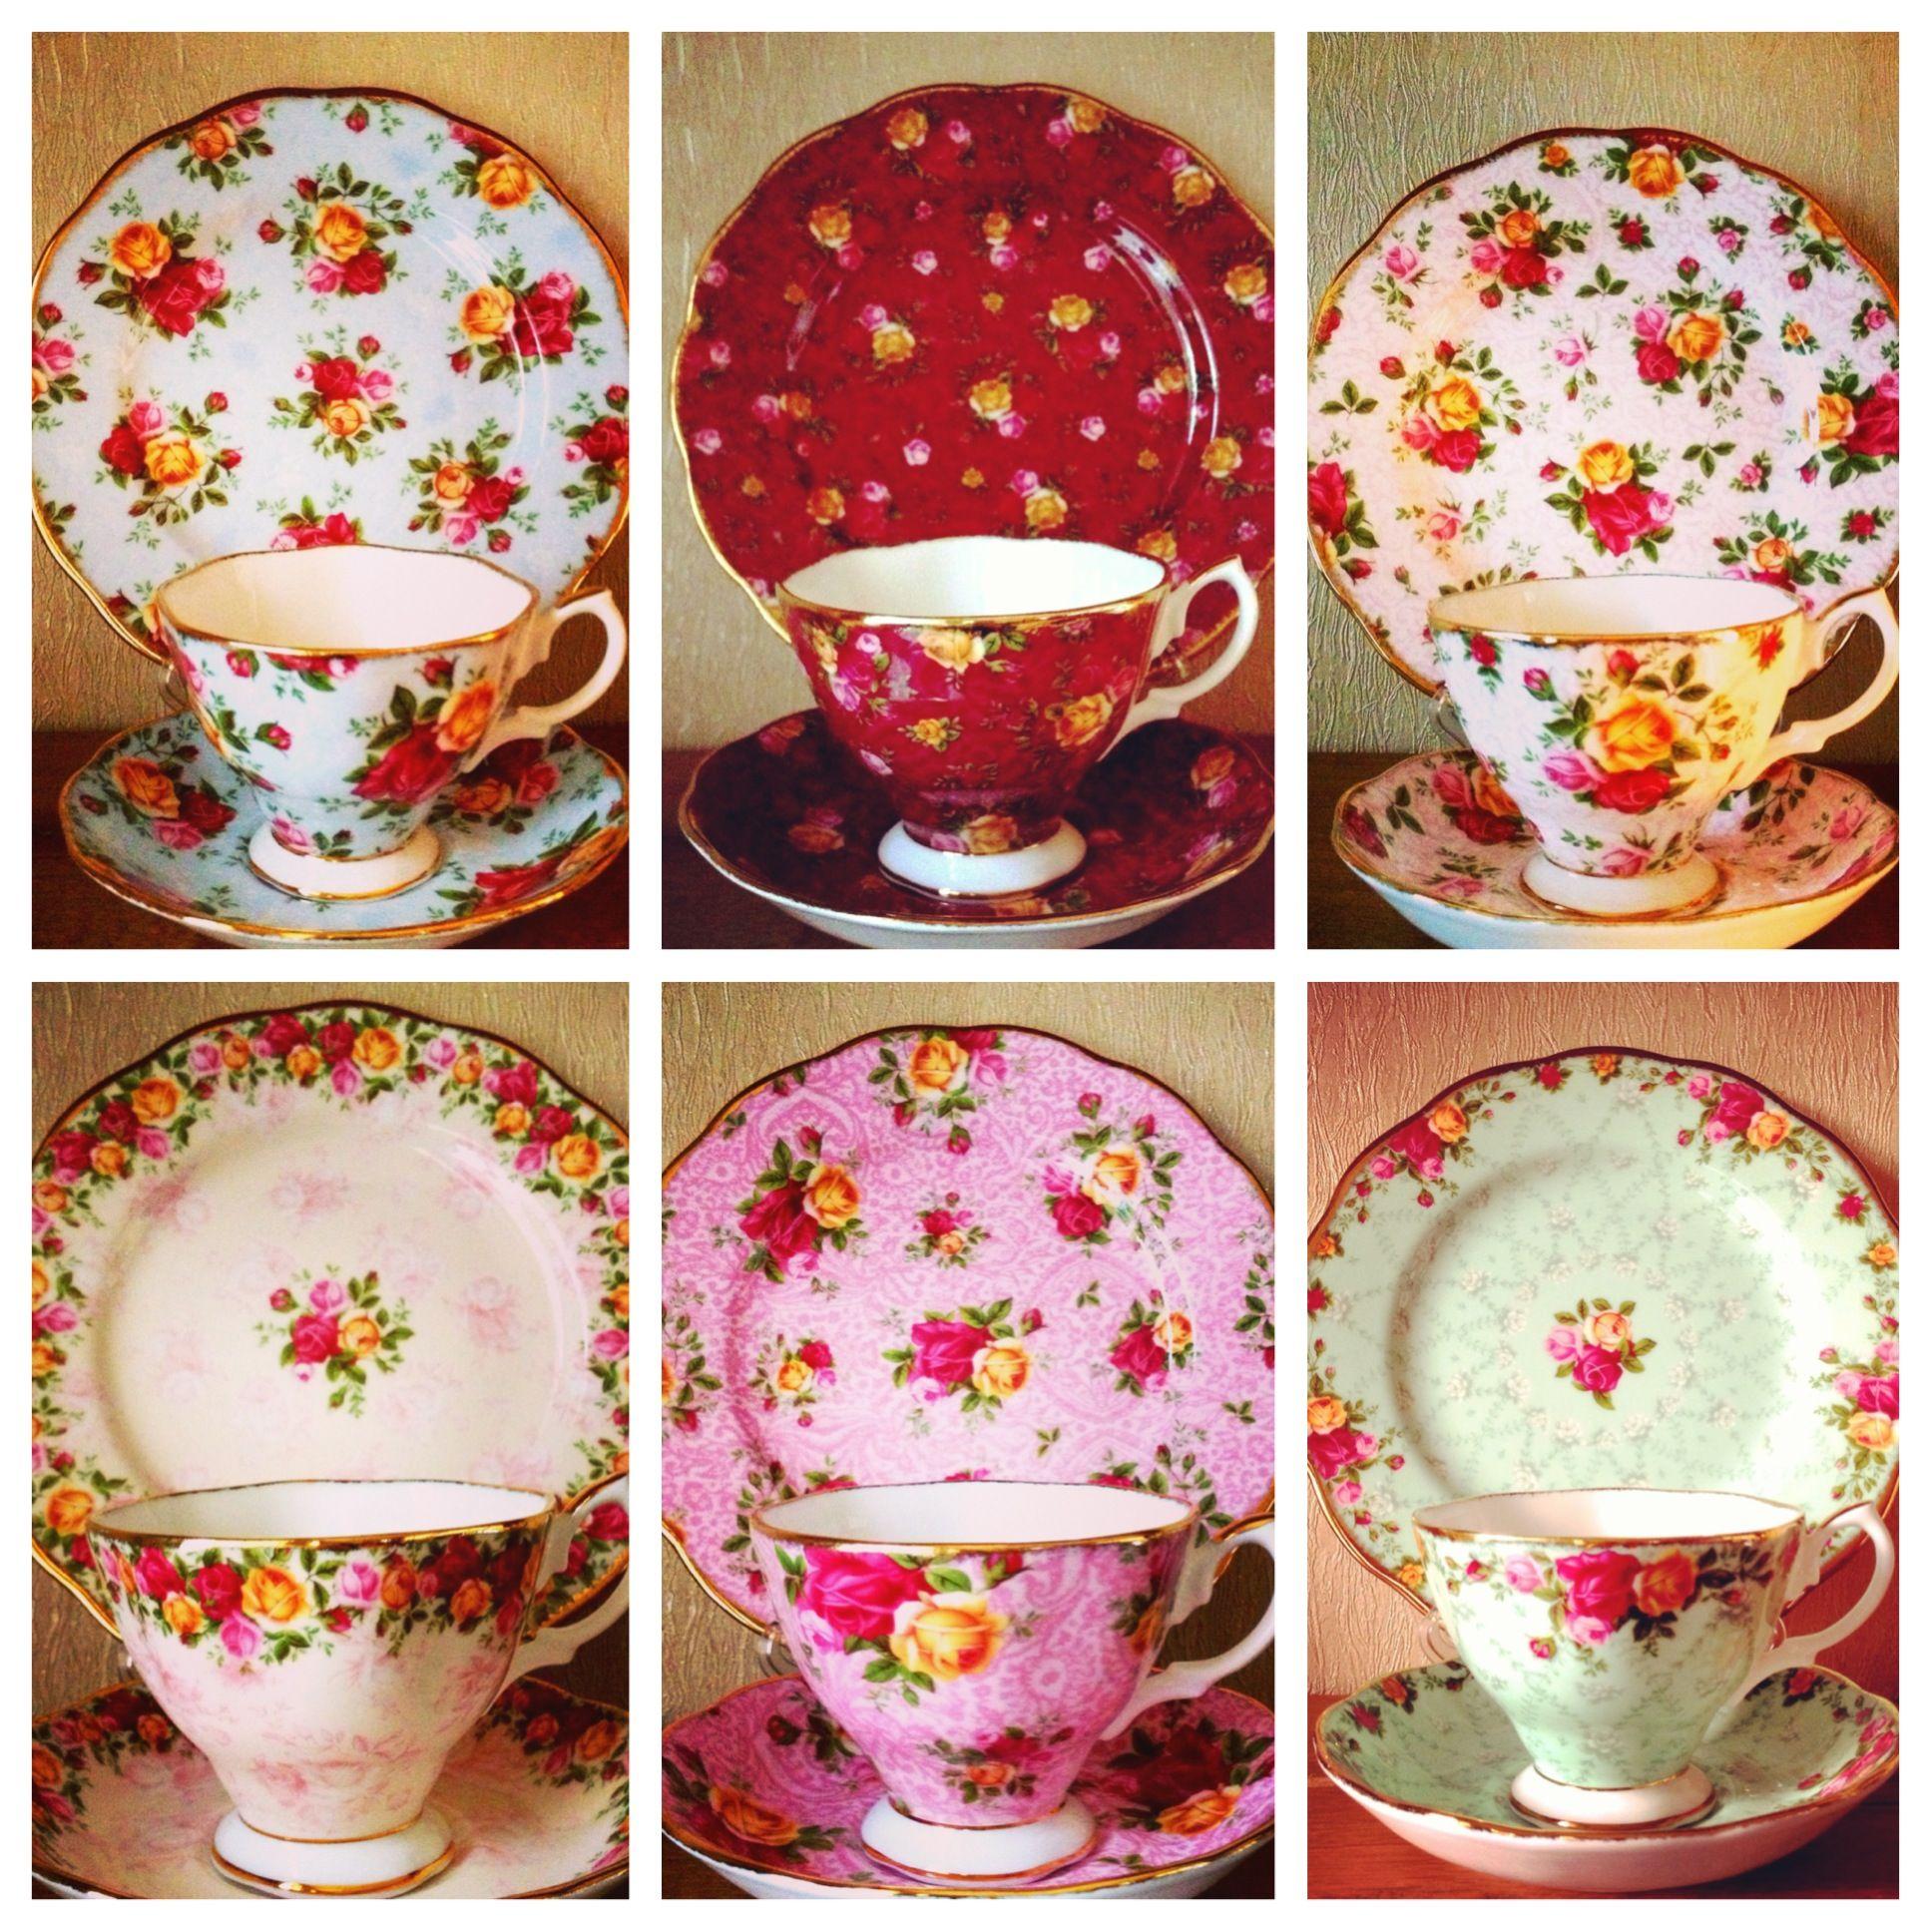 royal albert old country roses collectable teas vintage china porzellan und keramik. Black Bedroom Furniture Sets. Home Design Ideas